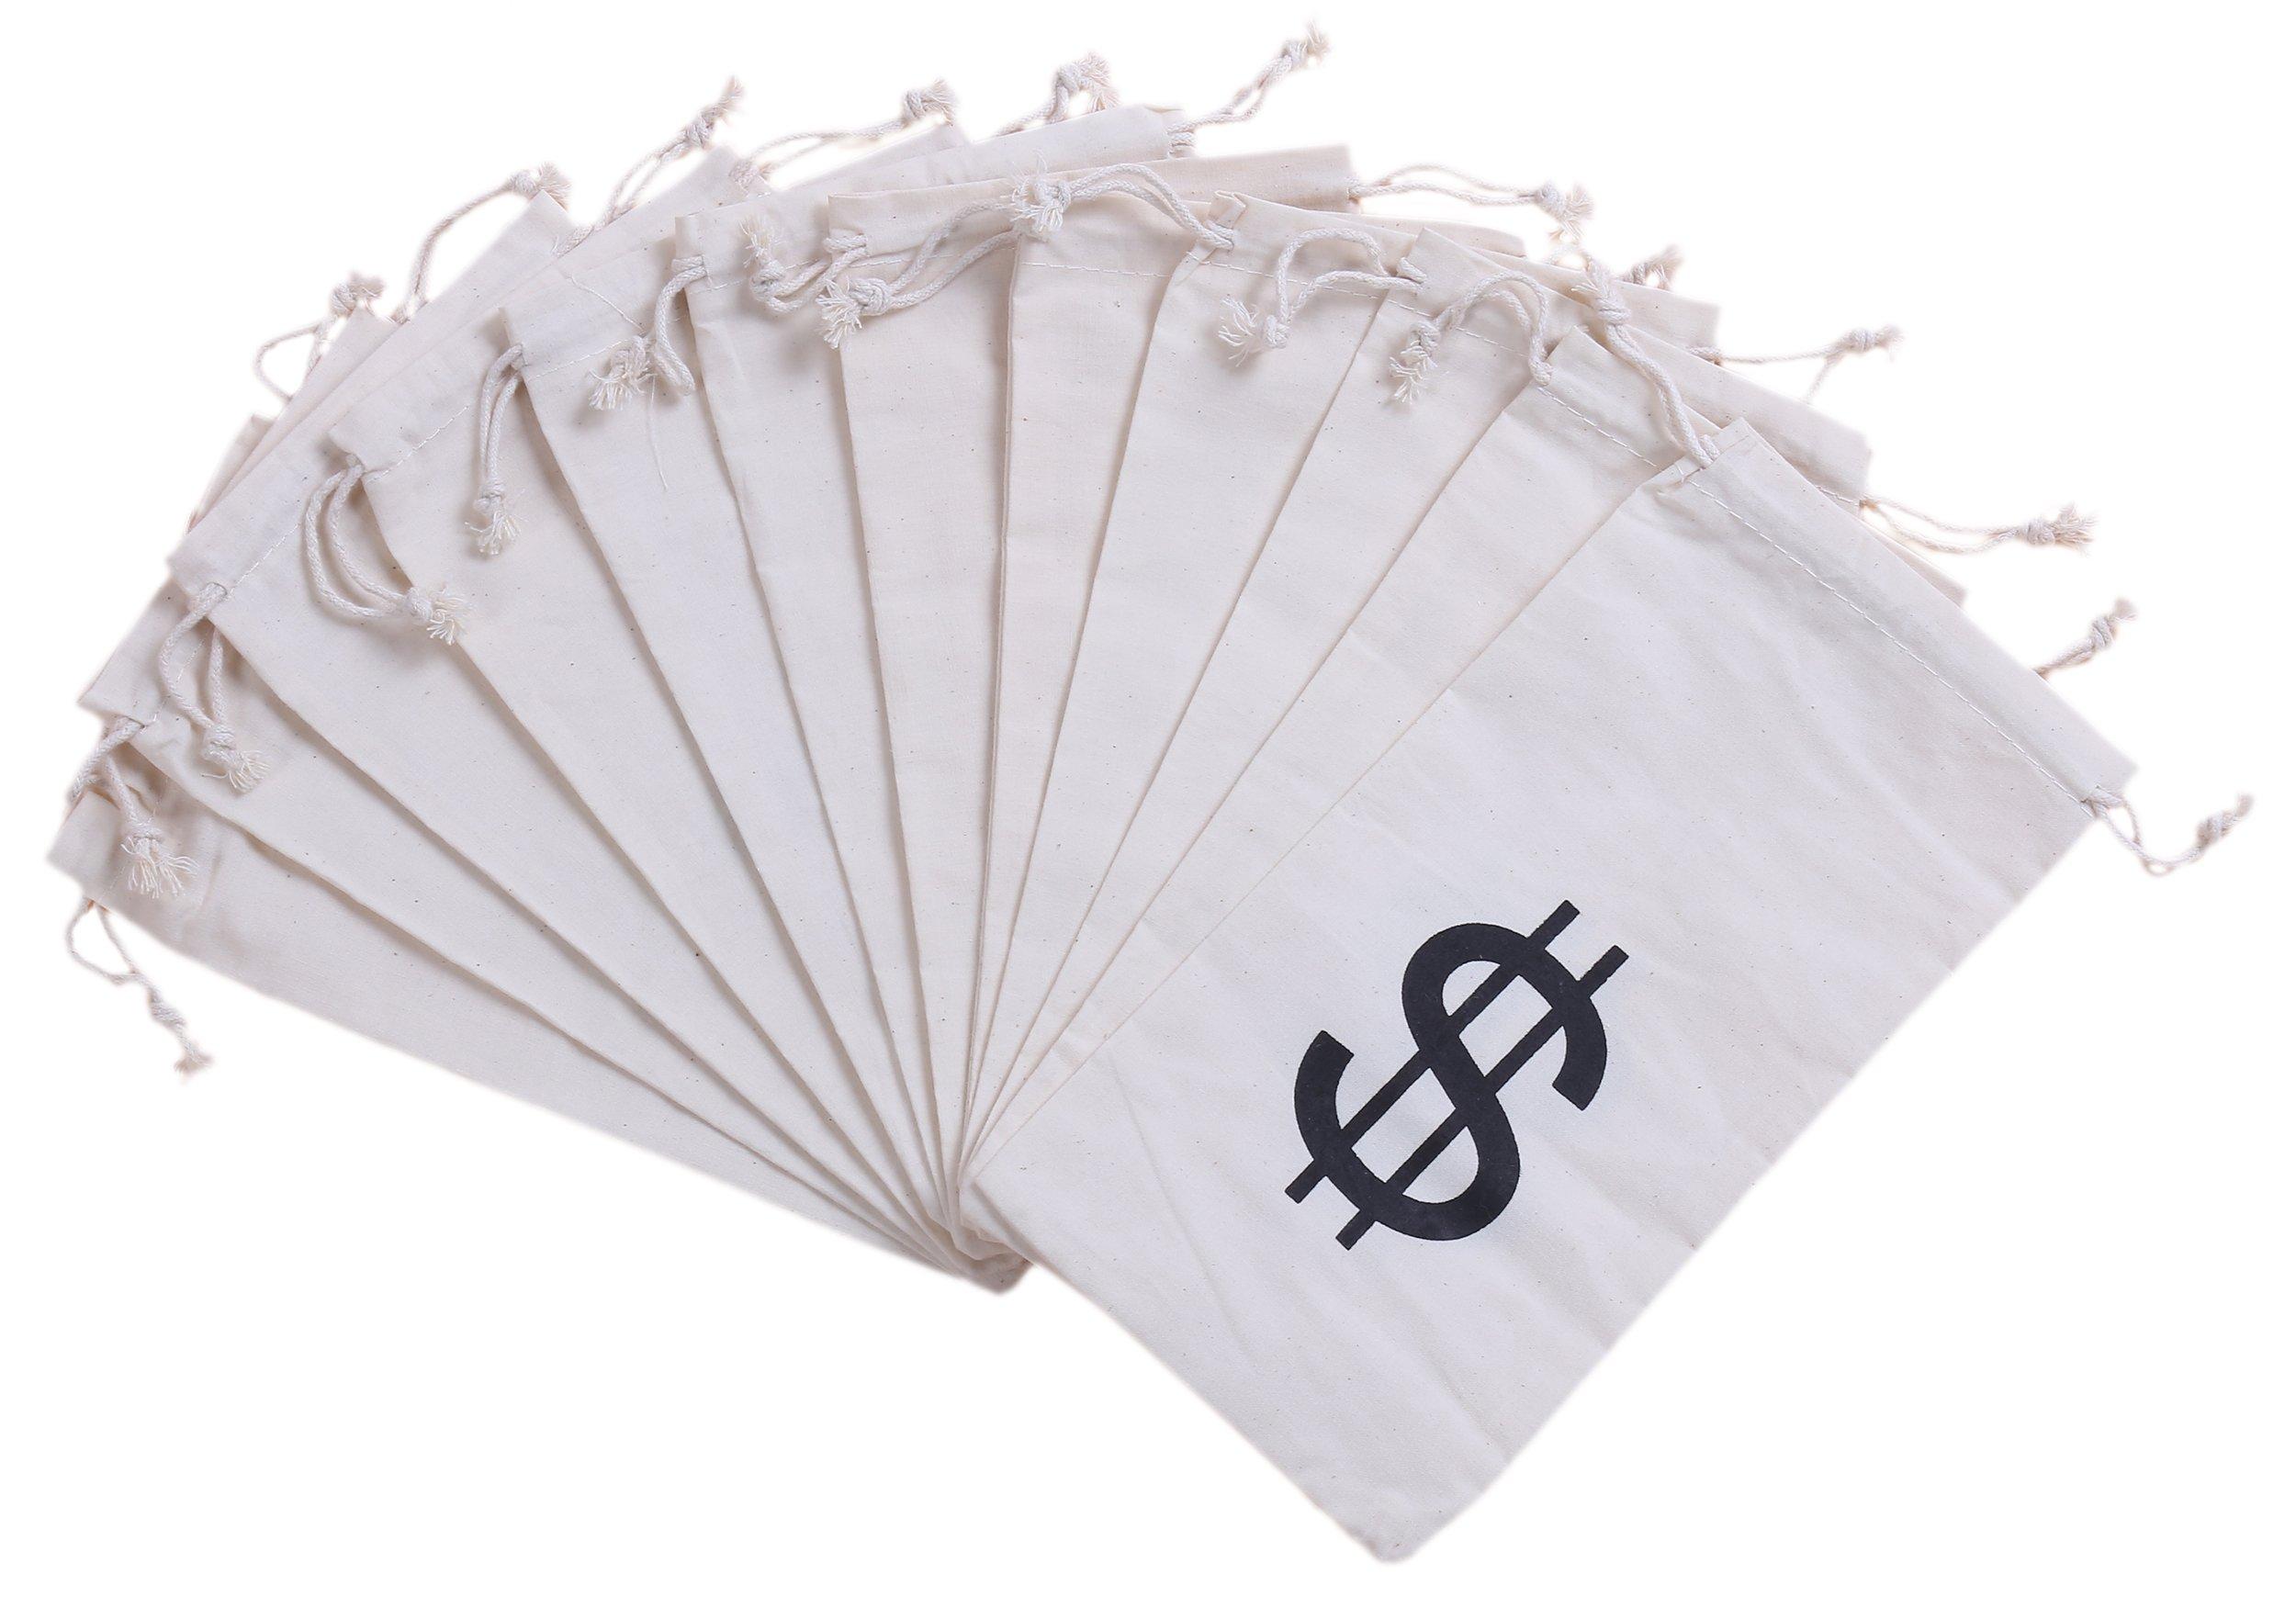 Juvale Money Bag Pouch Drawstring Closure Canvas Cloth Dollar Sign Symbol Novelty - $ - Set 12pcs - (4.7 x 9 inches)